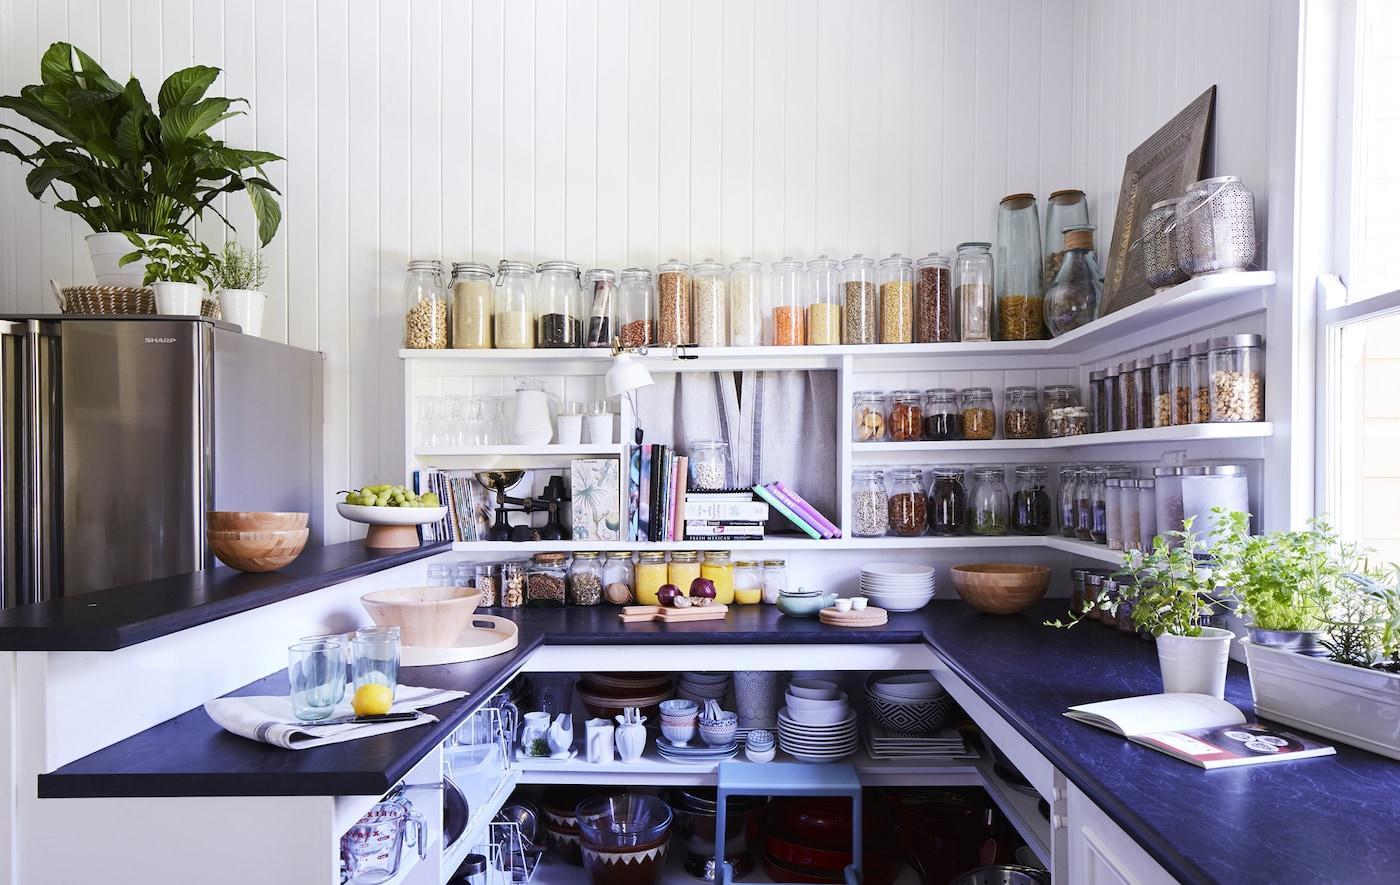 A kitchen with open storage.